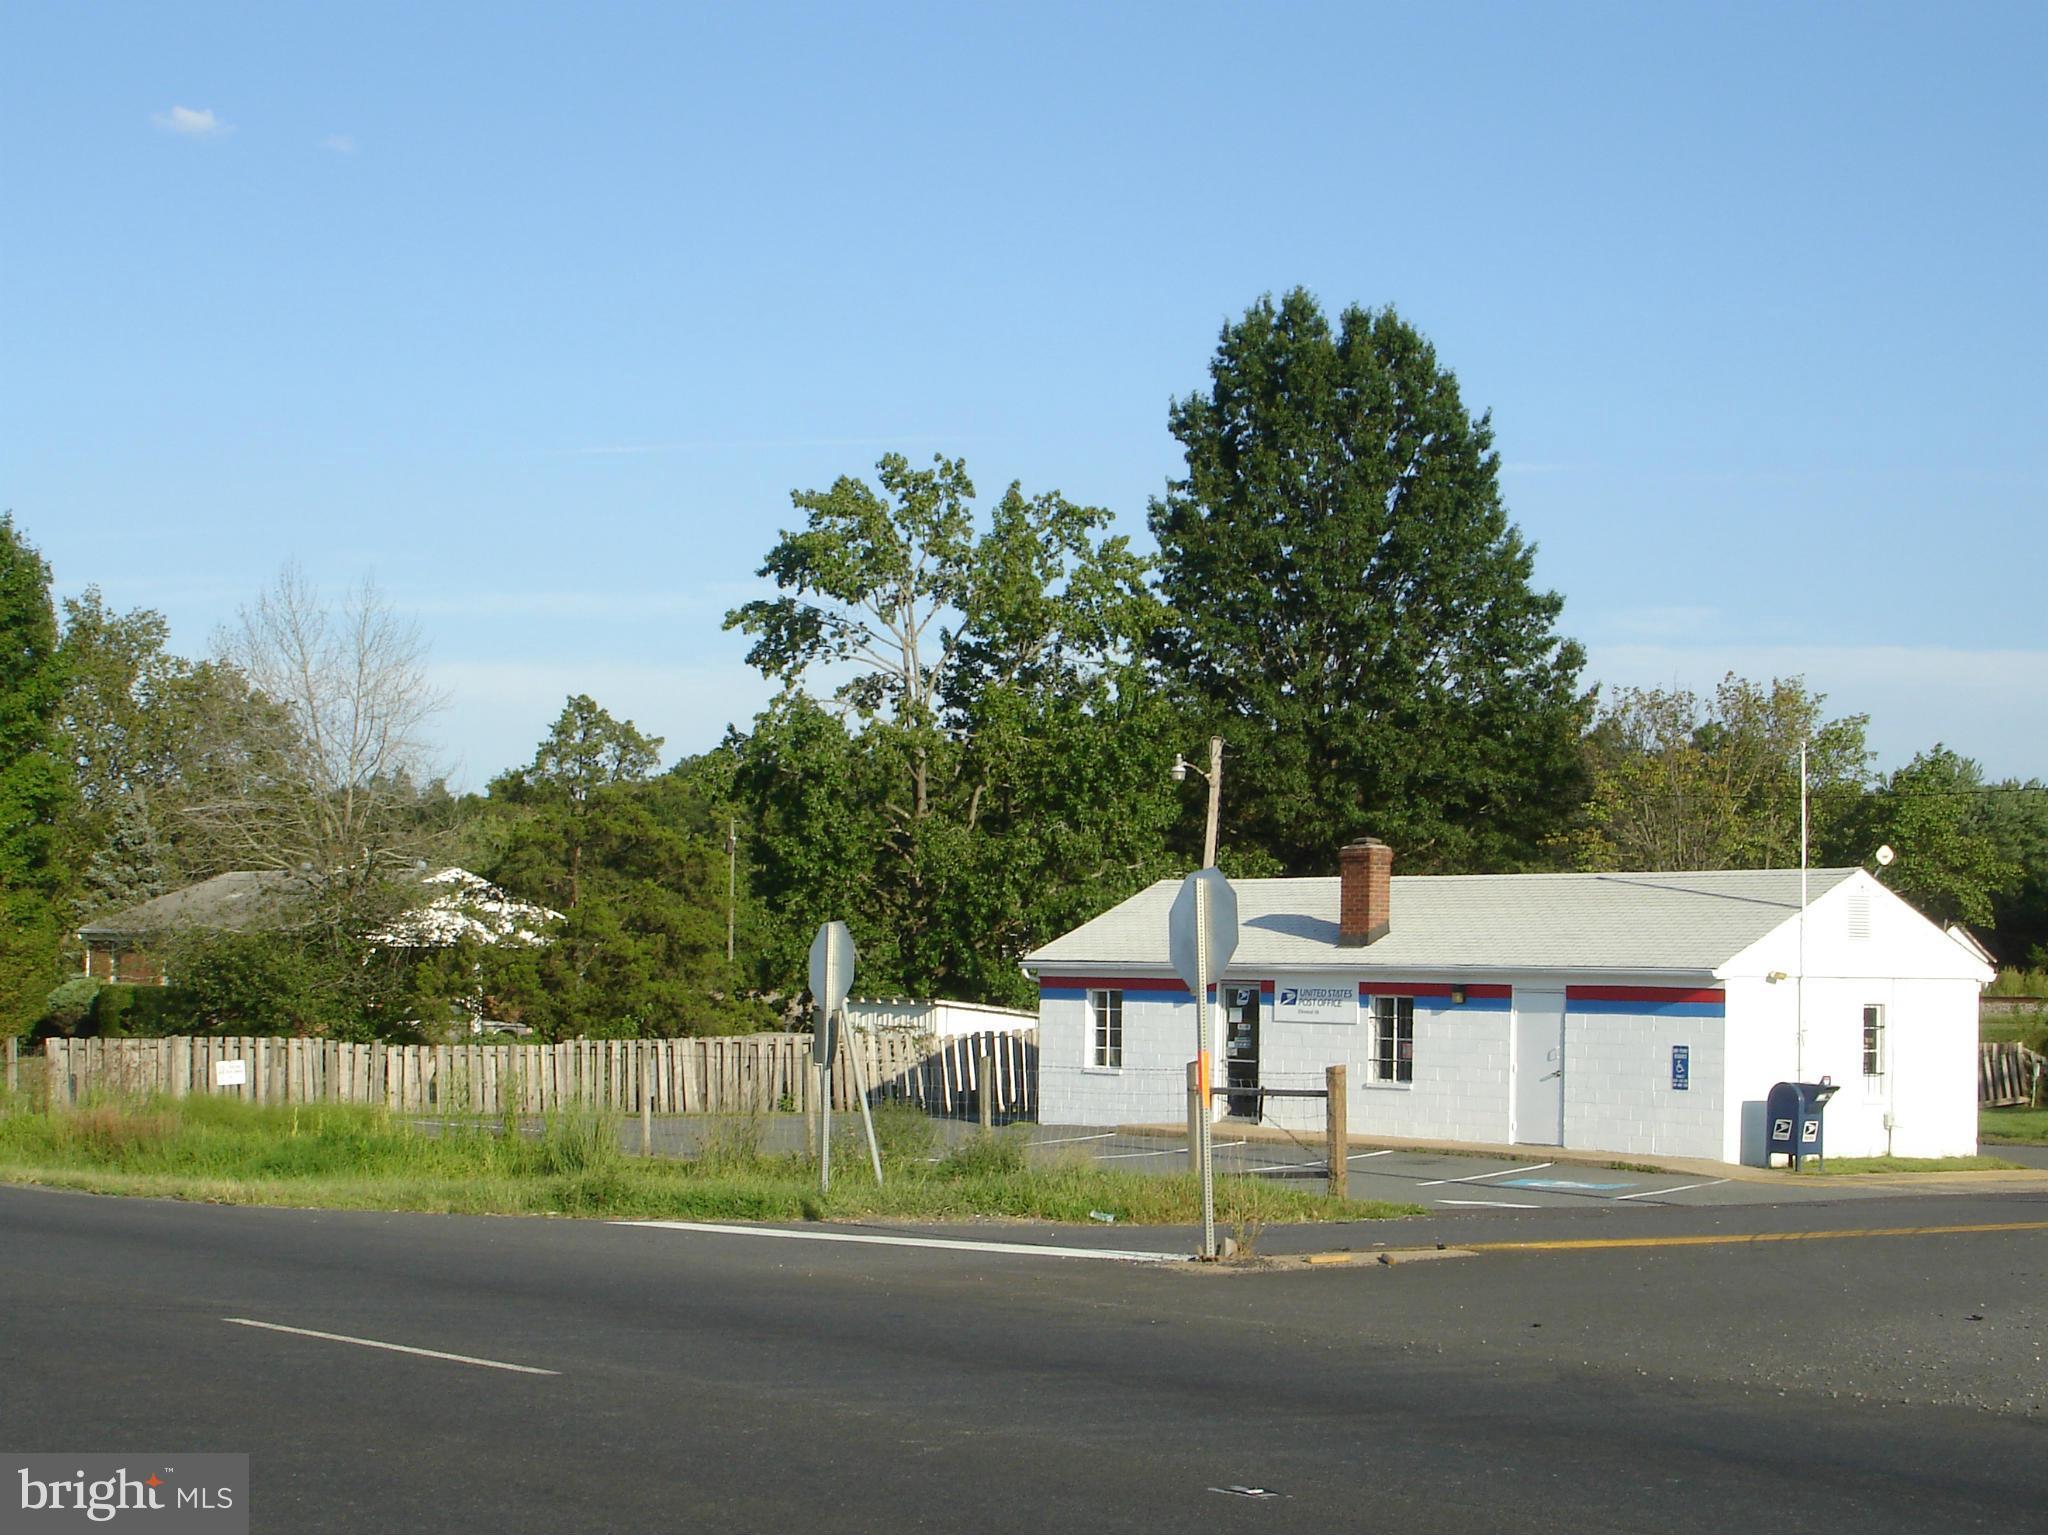 22098 JAMES MADISON HIGHWAY, ELKWOOD, VA 22718